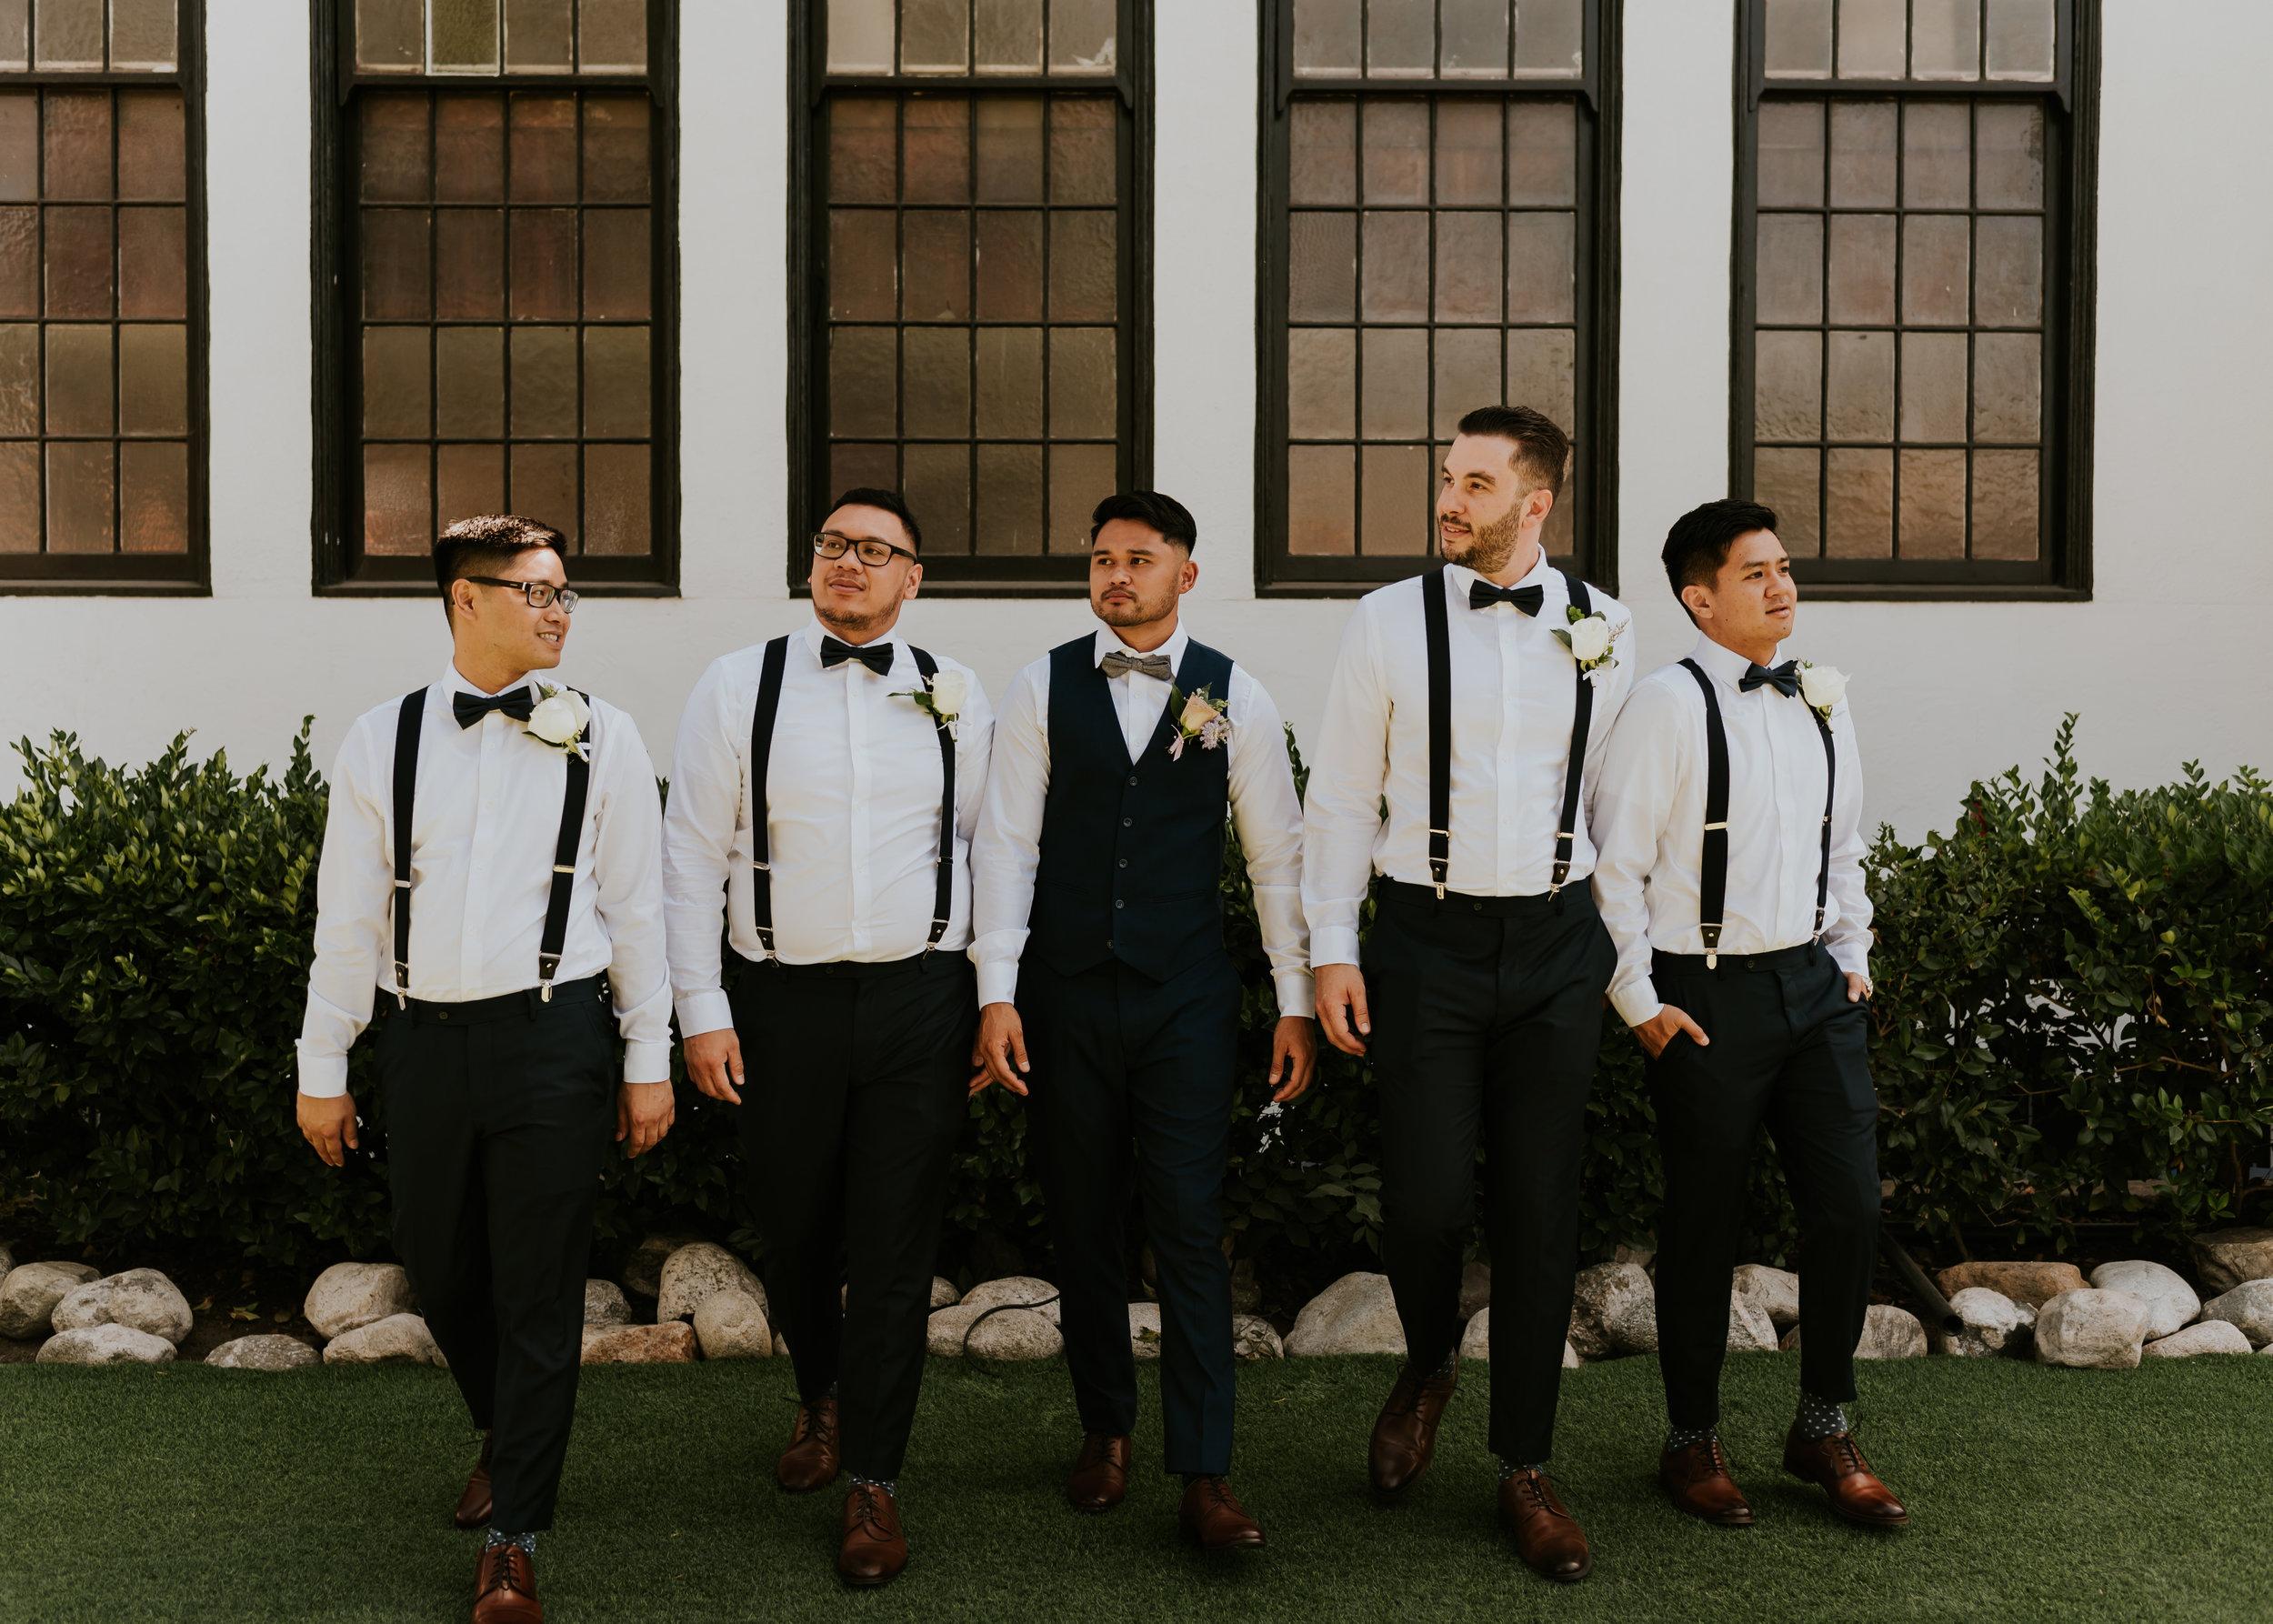 York Manor Wedding | Los Angeles, California | Los Angeles Wedding Photographer | Bridal Party